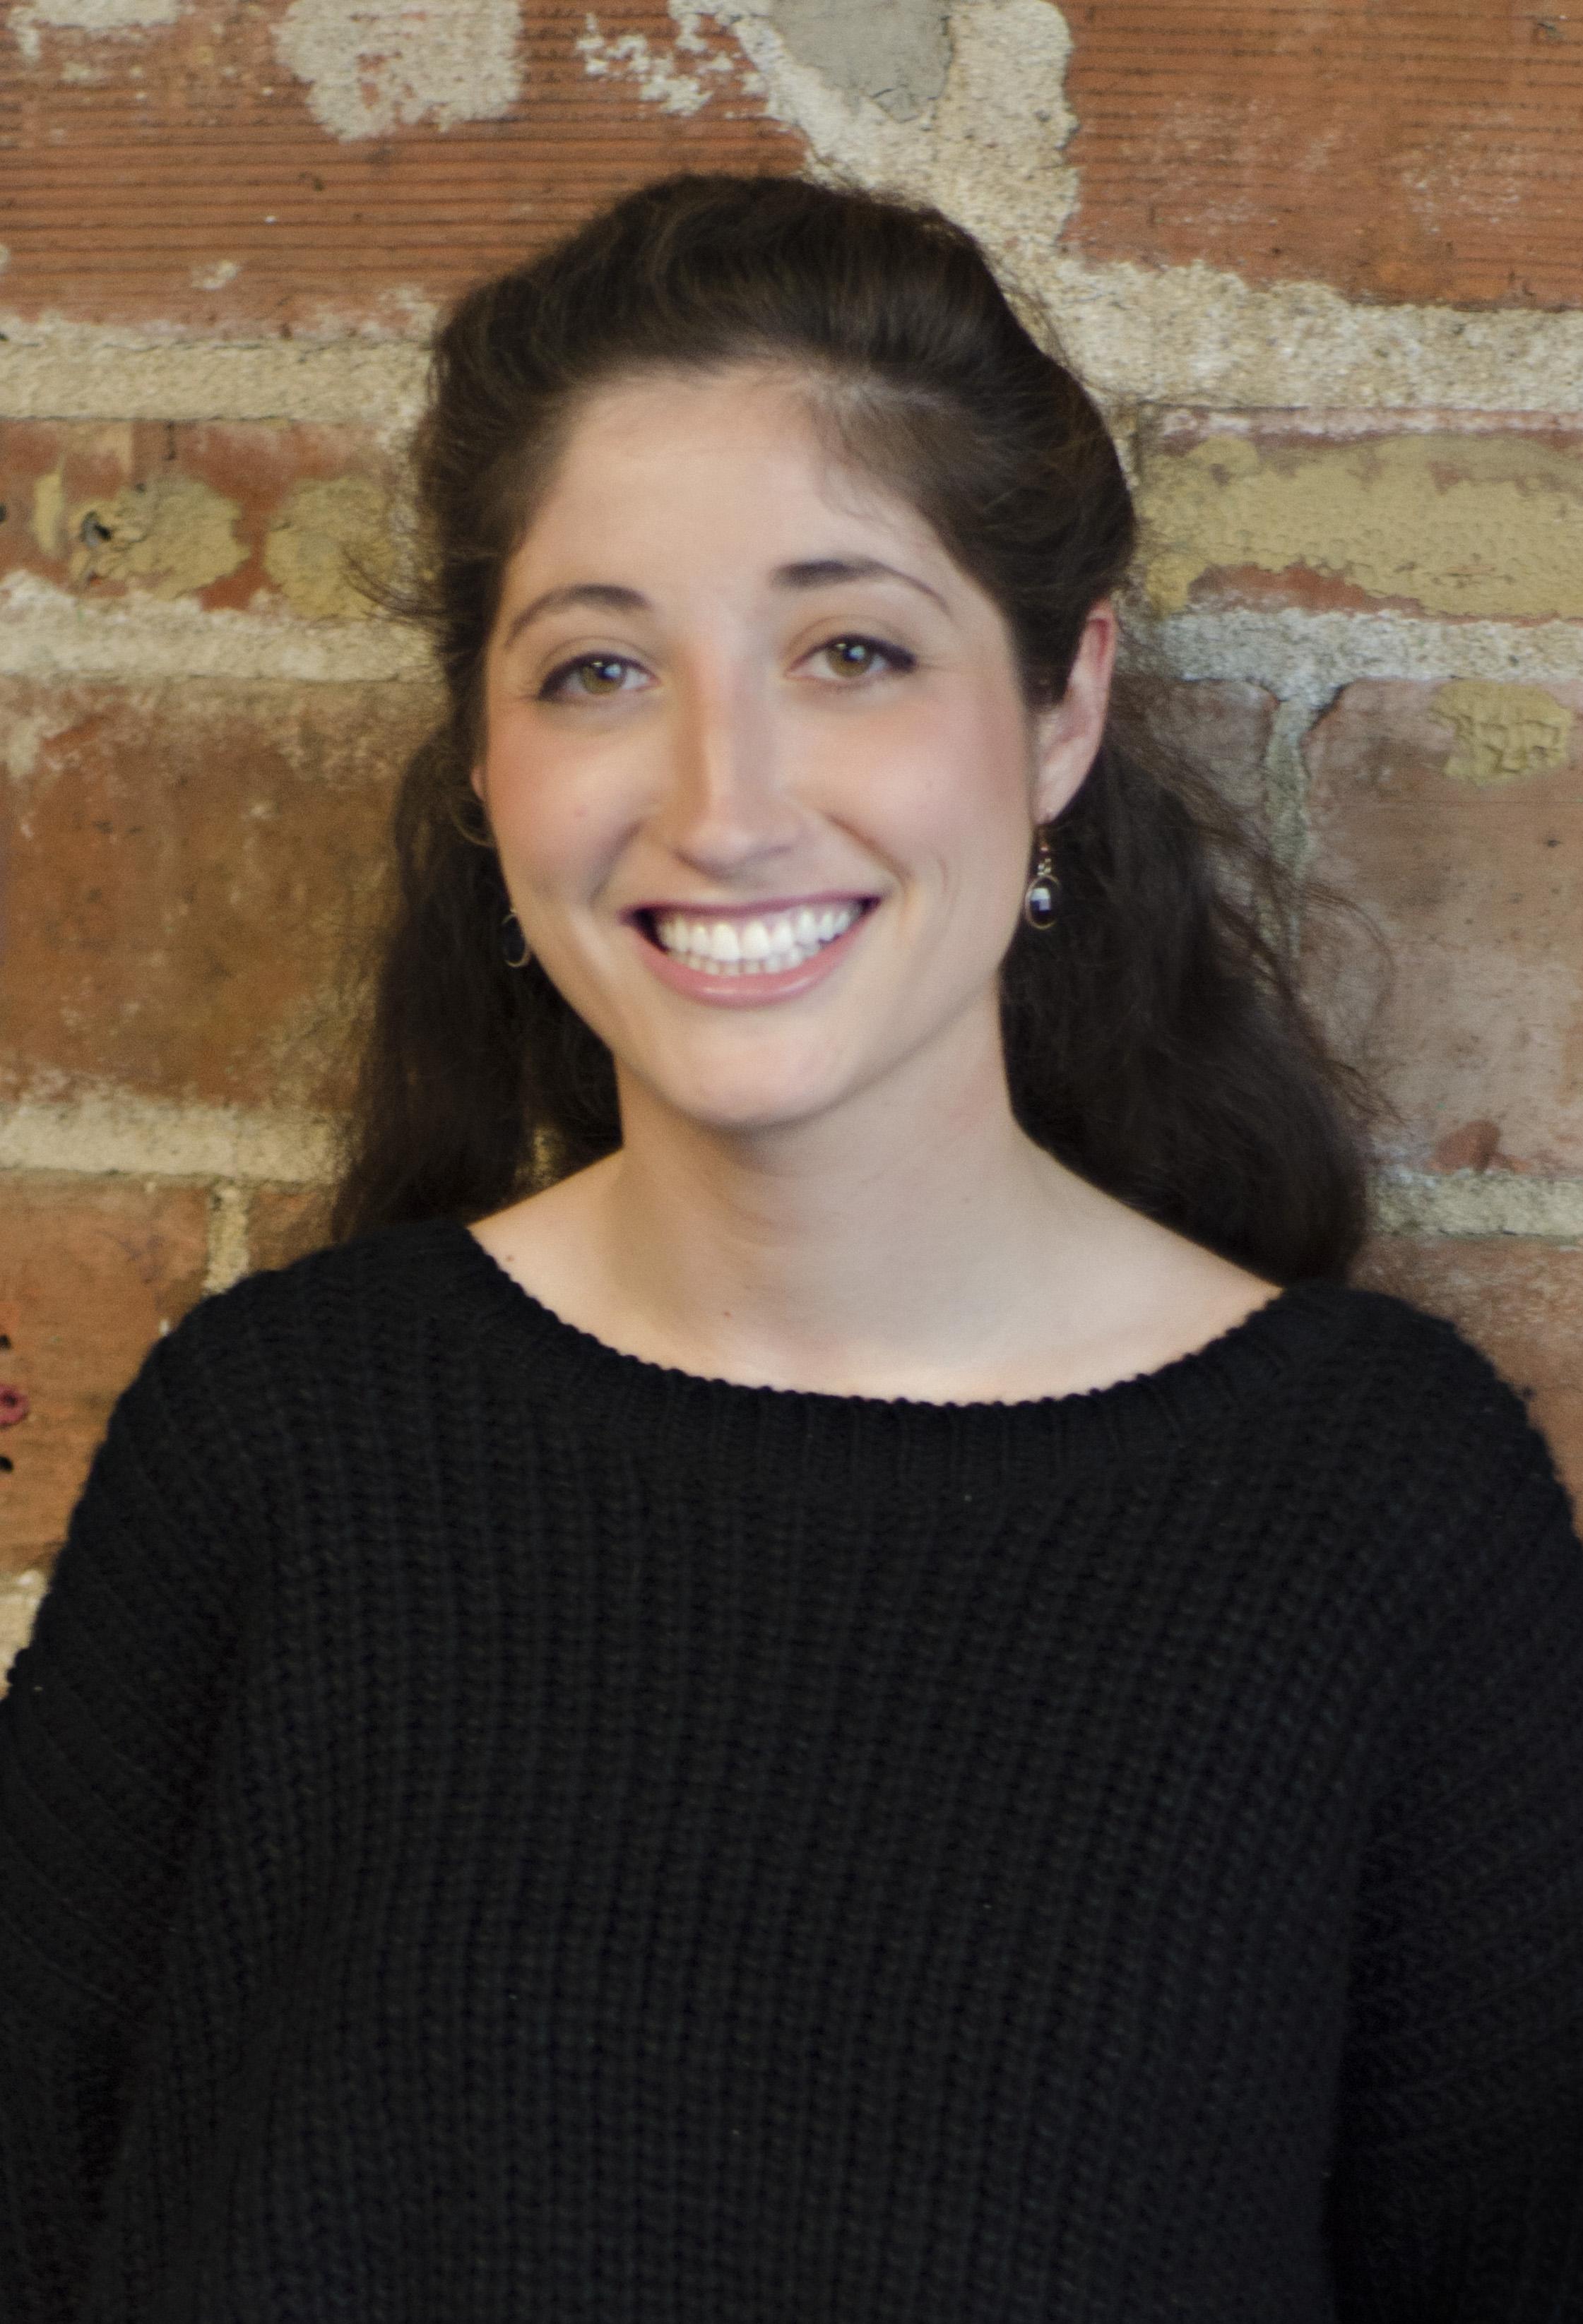 Danielle Dannenberg